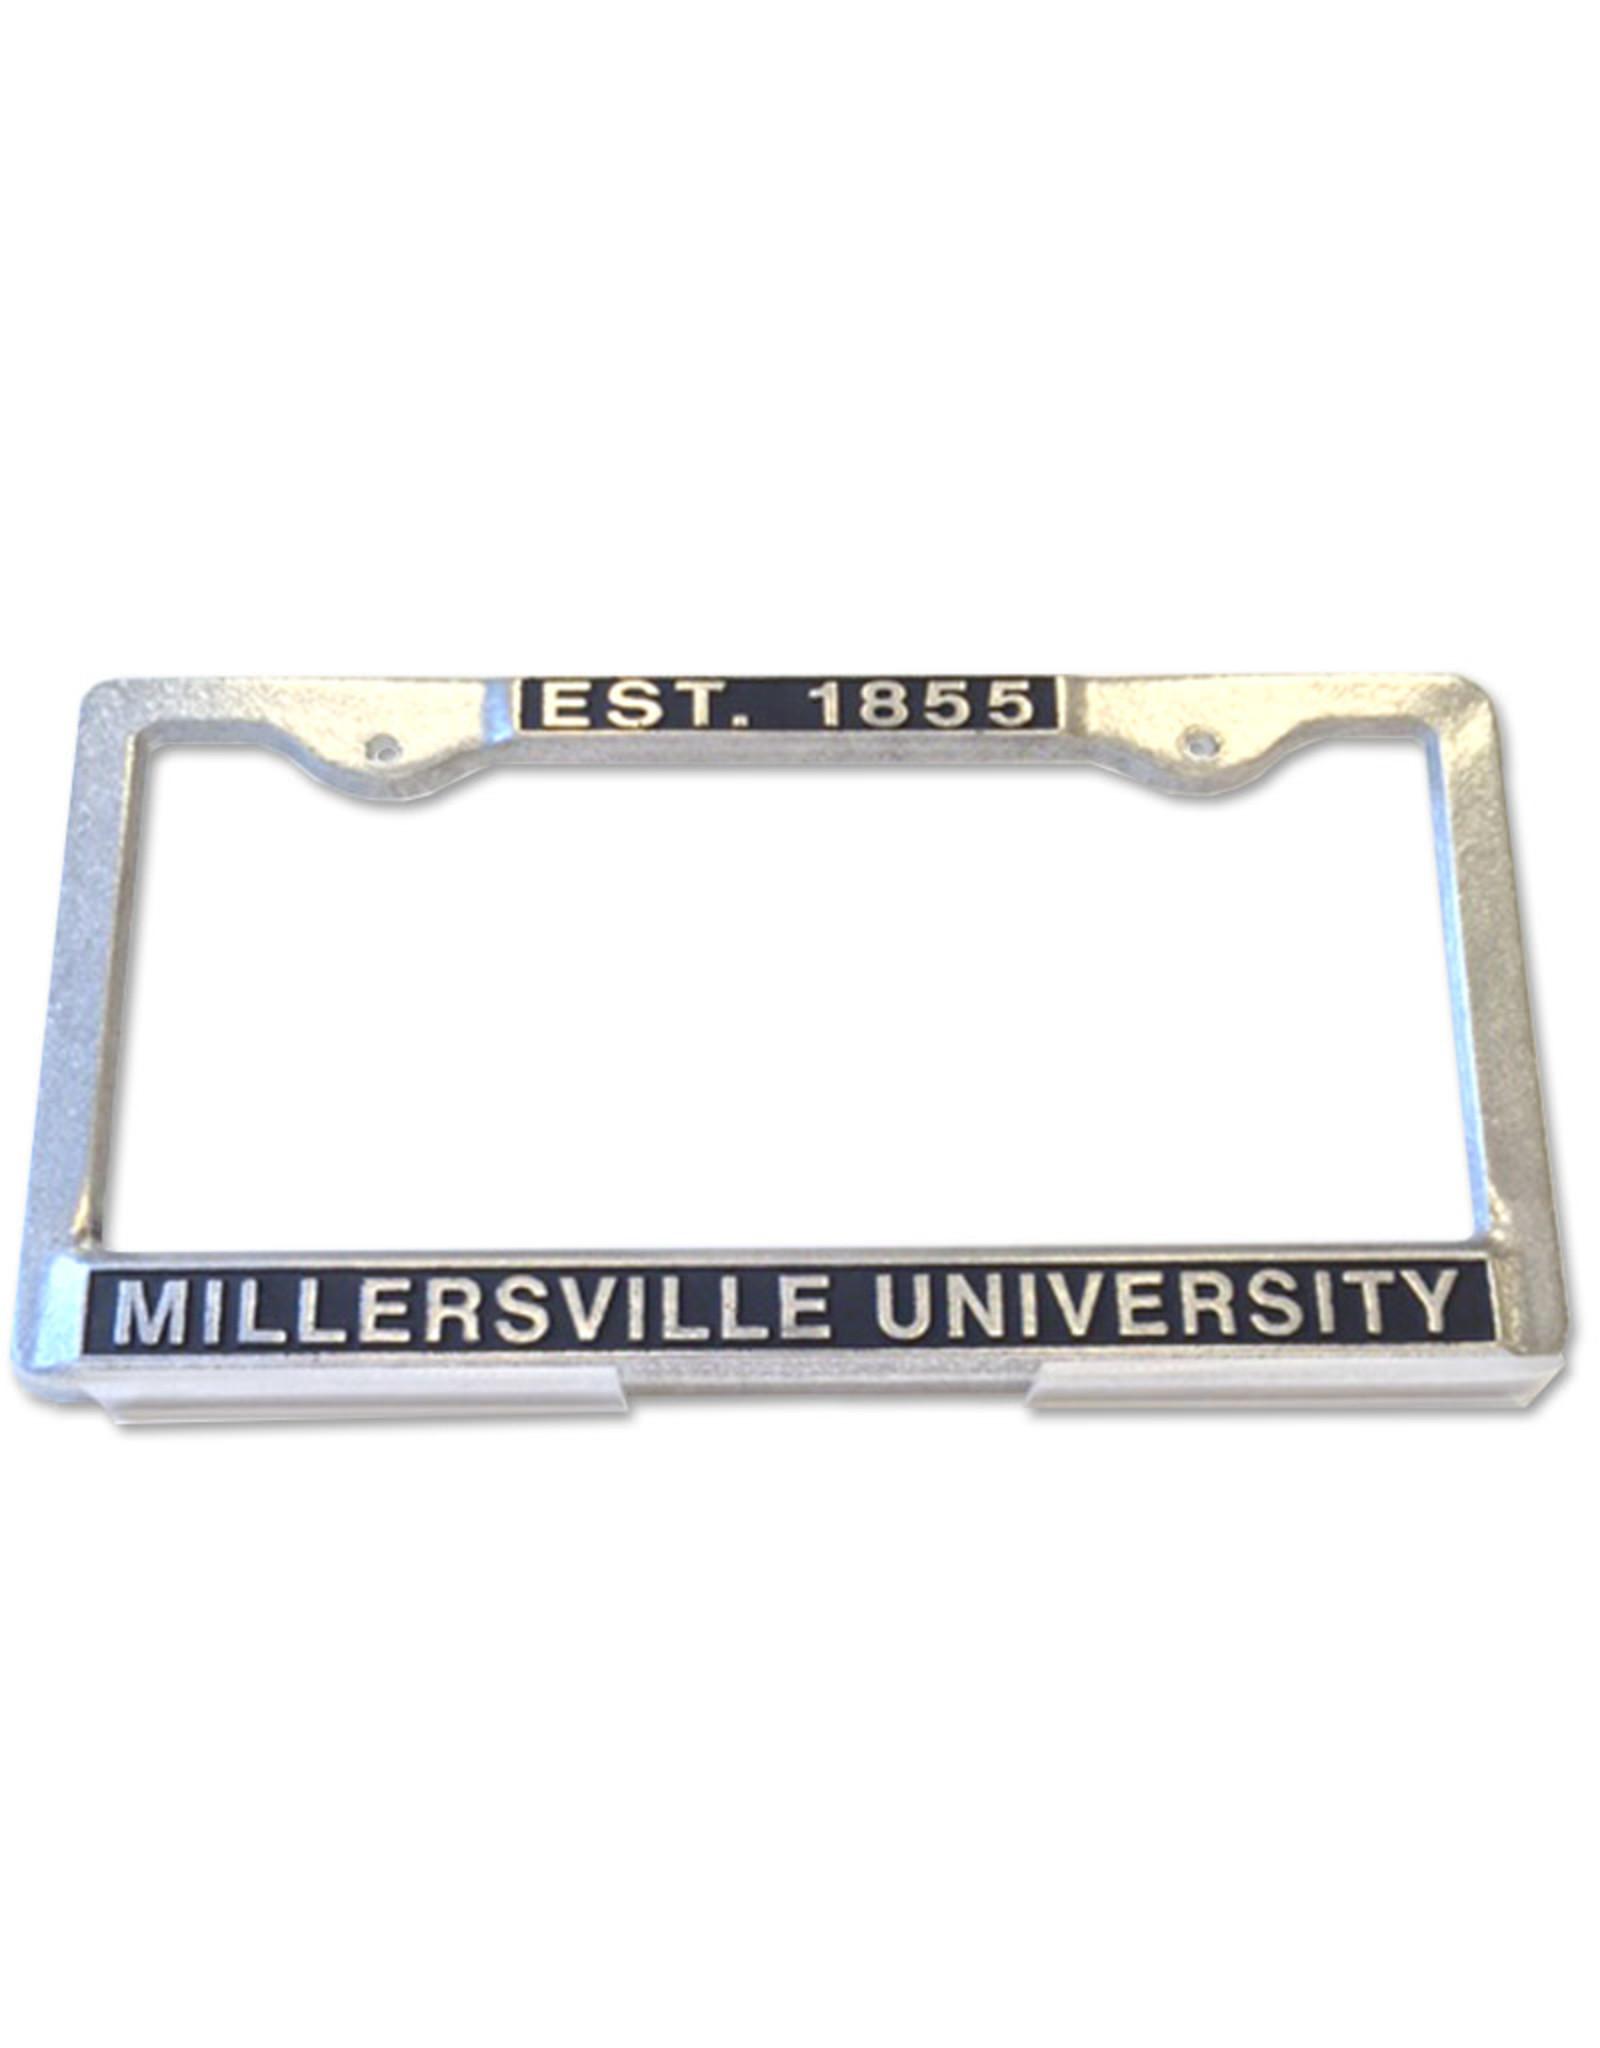 MU Est. 1855 Pewter License Plate Frame